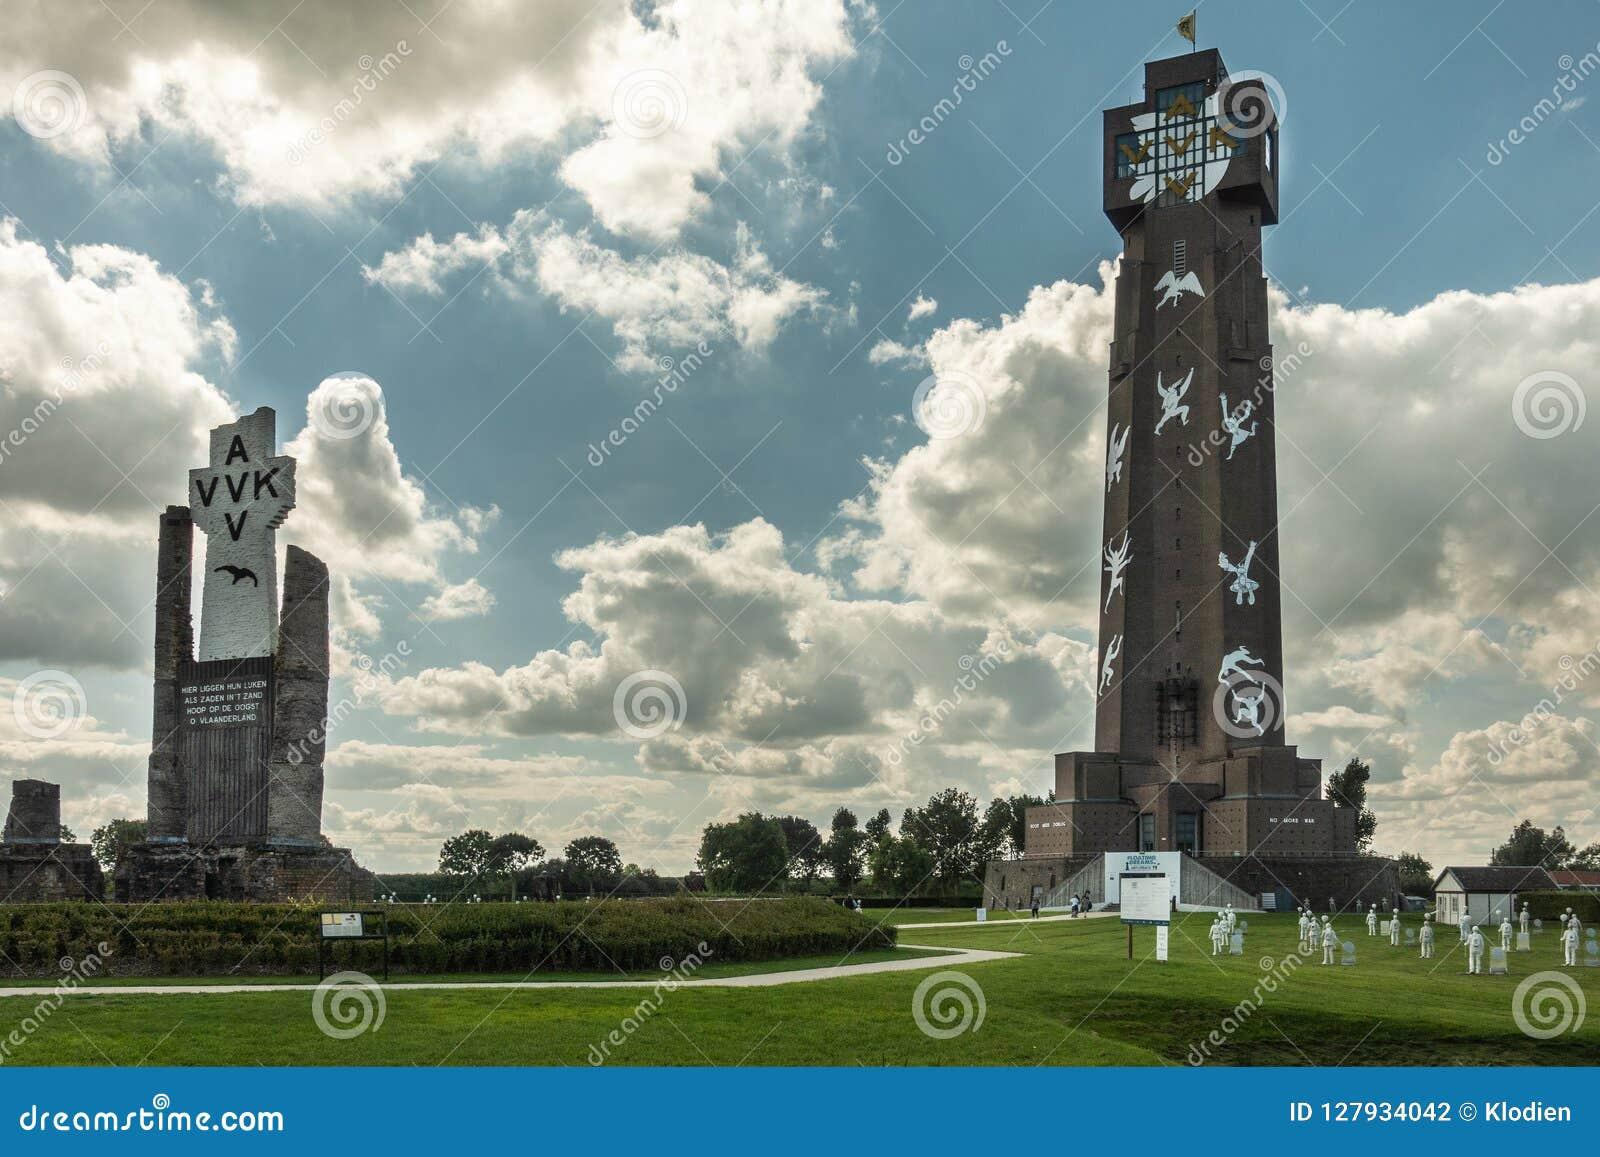 Ijzertoren和PAX土窖在迪克斯梅德,比利时